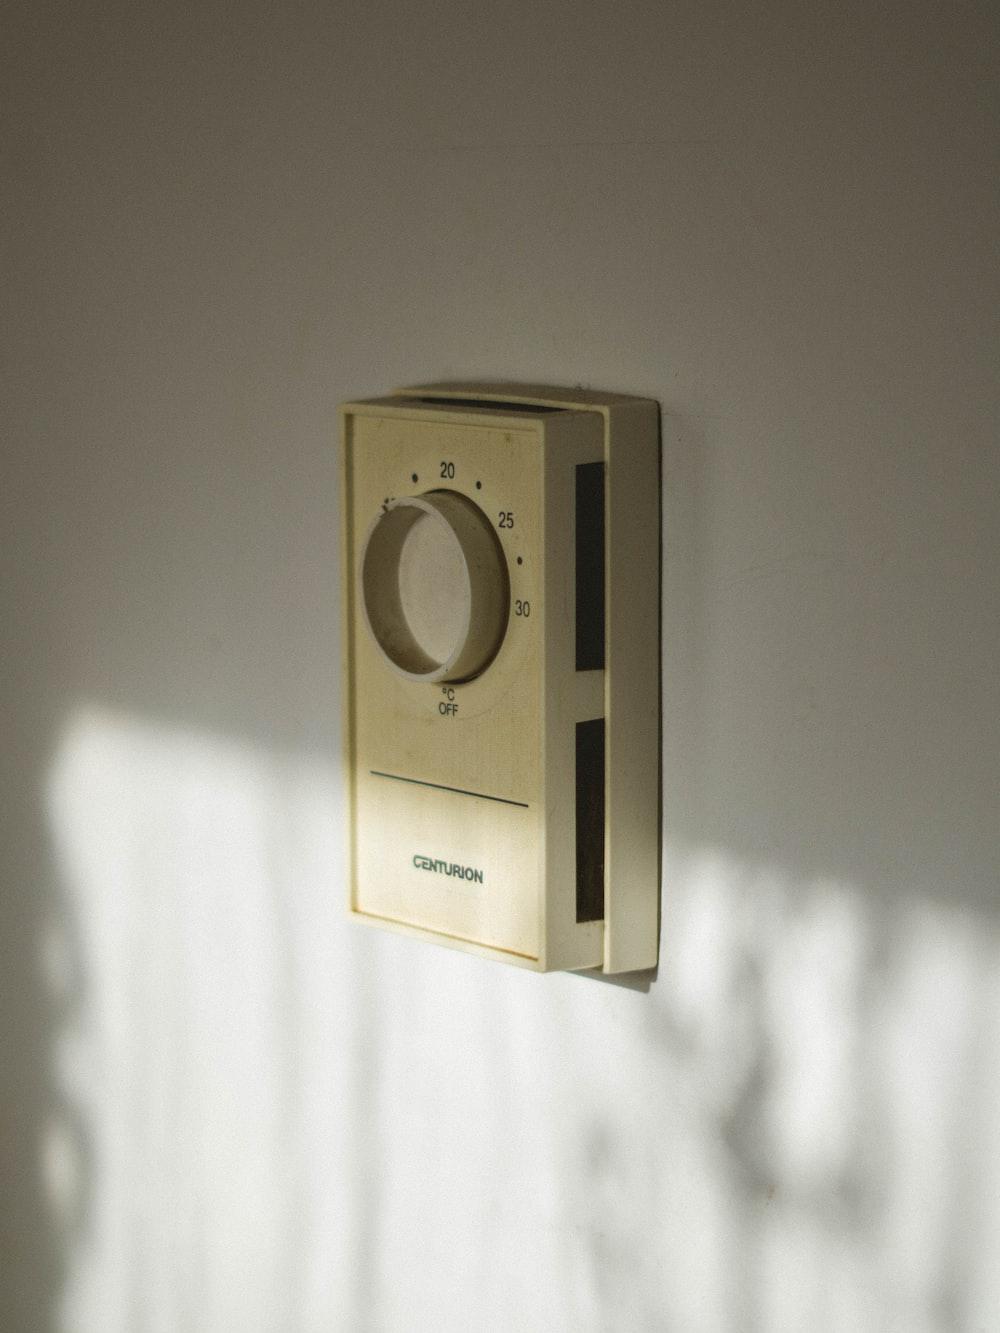 beige Centurion home appliance controller on wall